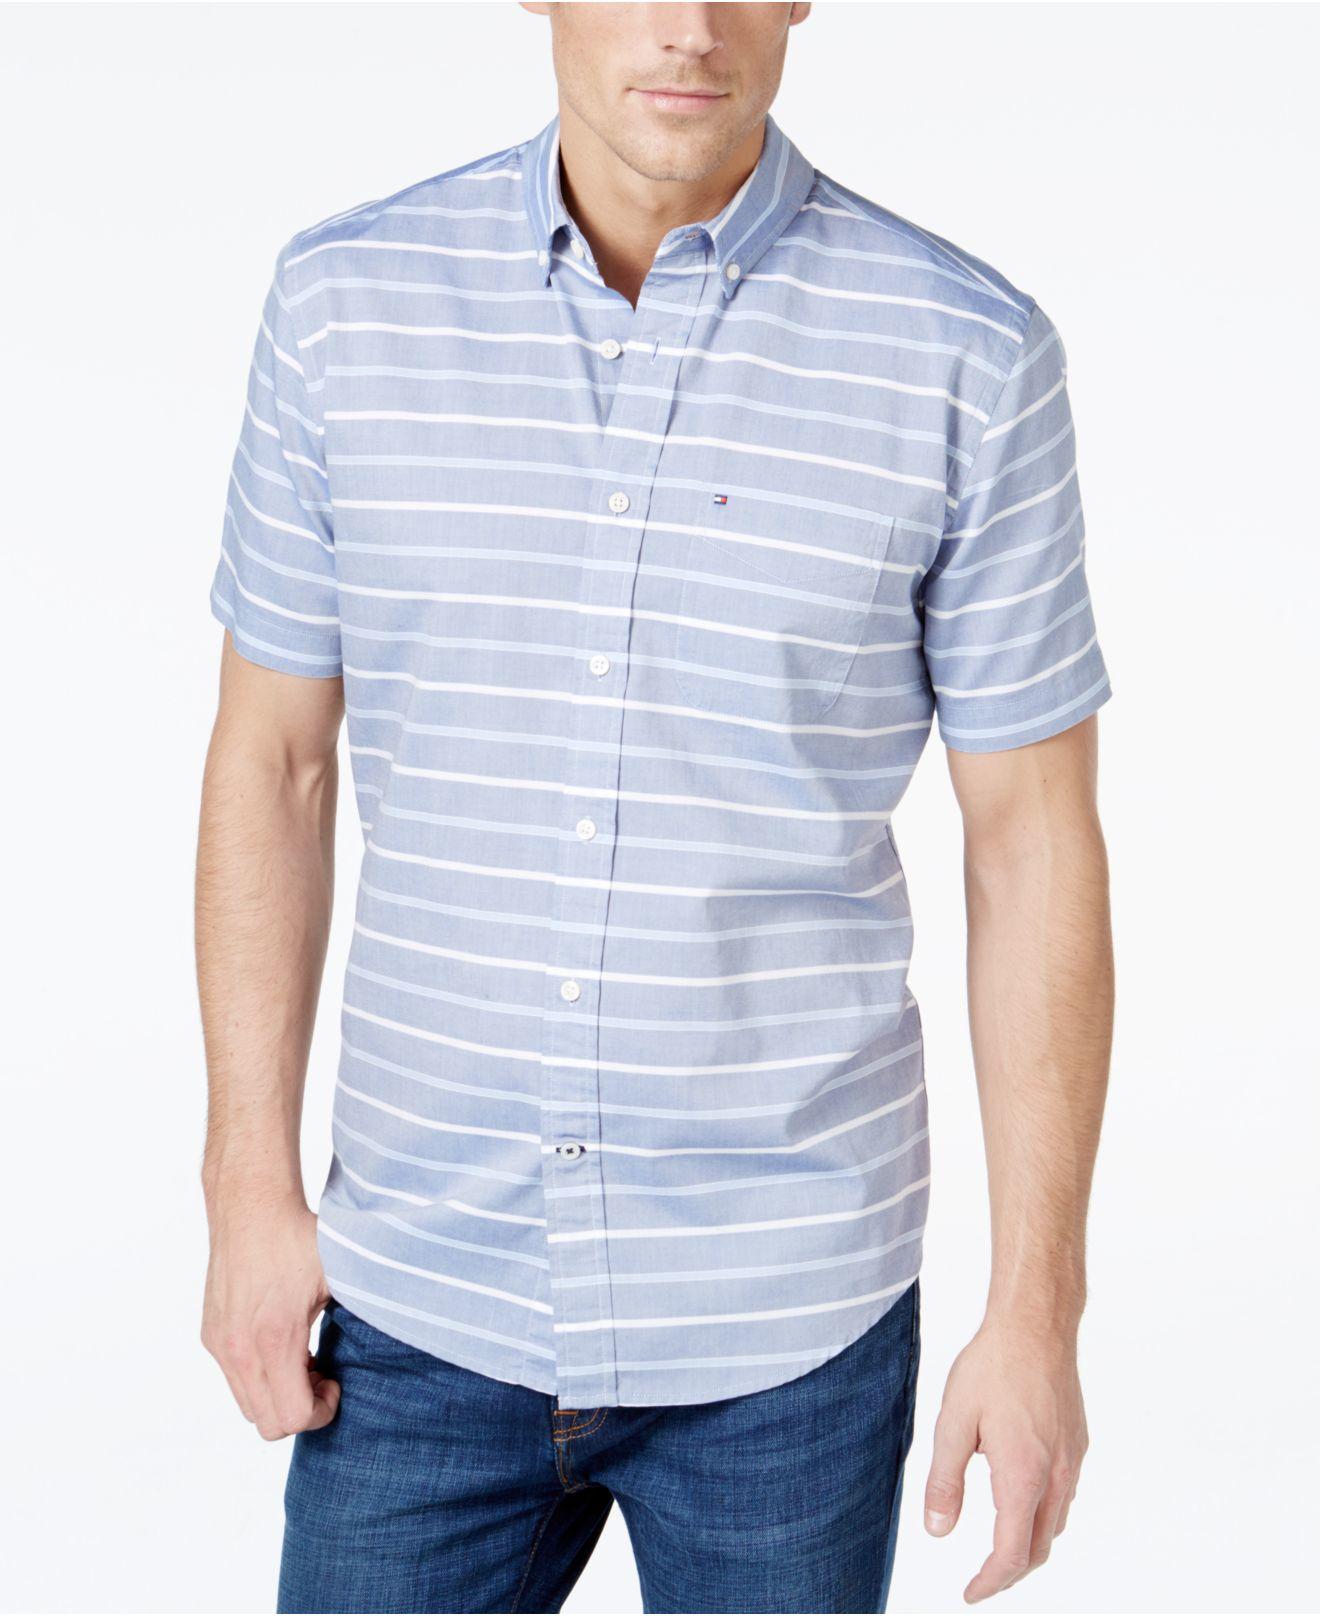 Tommy hilfiger malcom horizontal stripe short sleeve shirt for Horizontal striped dress shirts men